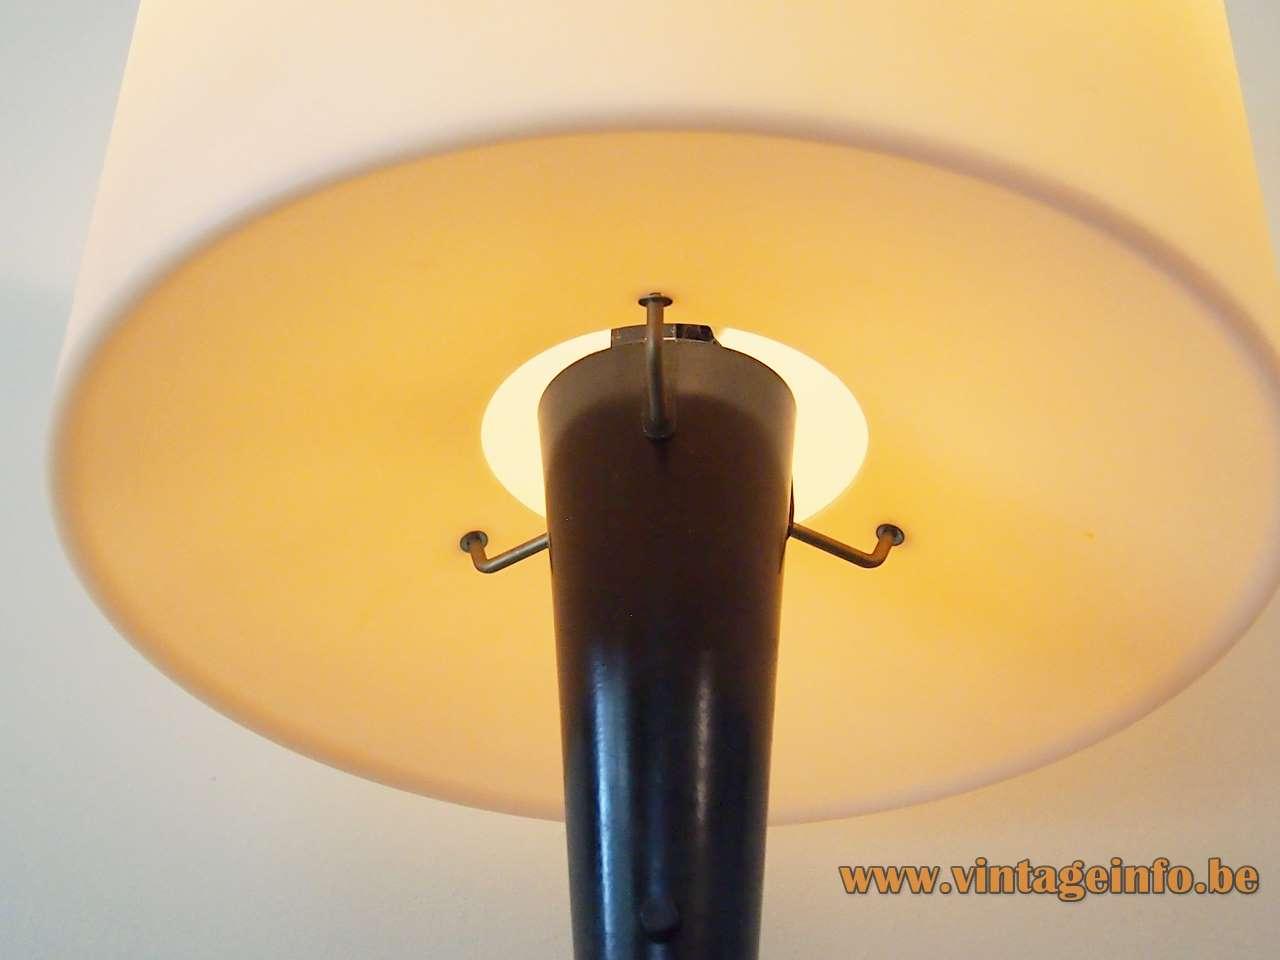 Lumina Duo table lamp design: Luciano Balestrini Paola Longhi metal base opal glass lampshade 1990s 2000s